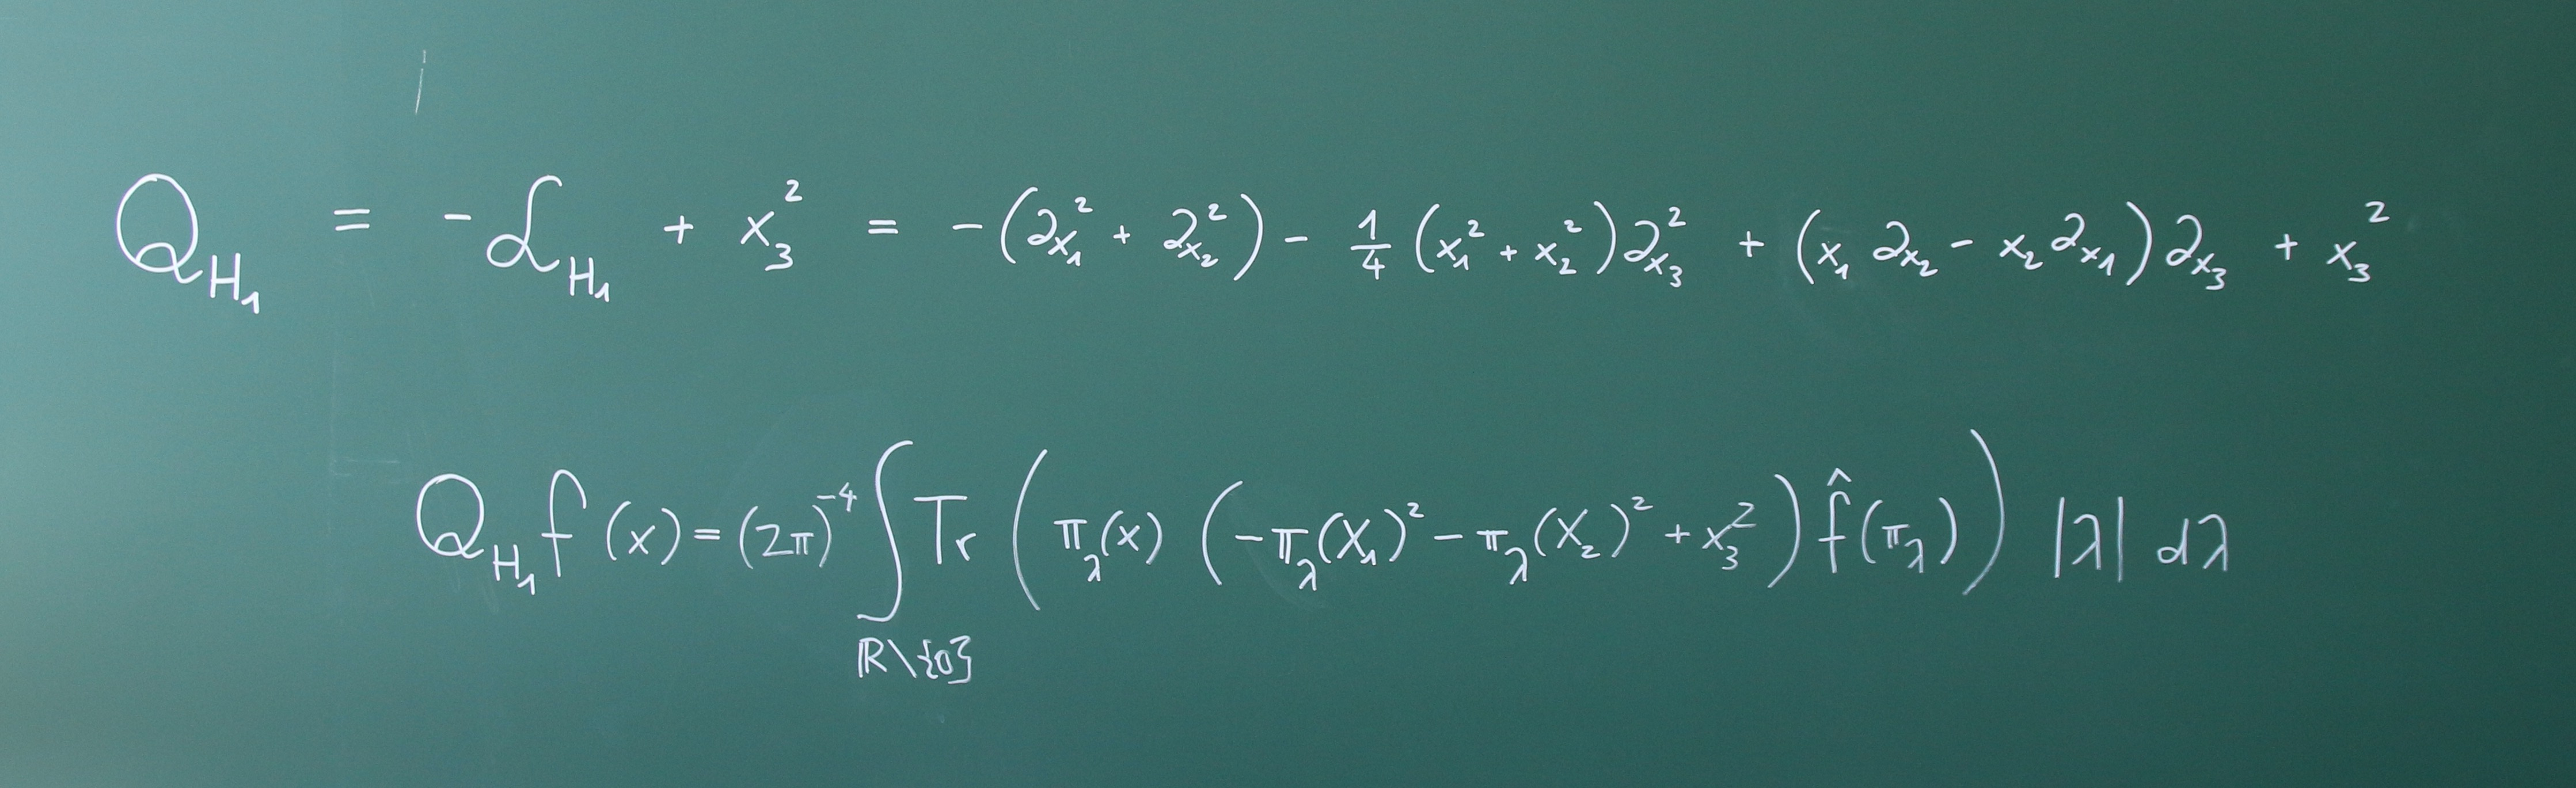 Formulas-harmonic-oscillator